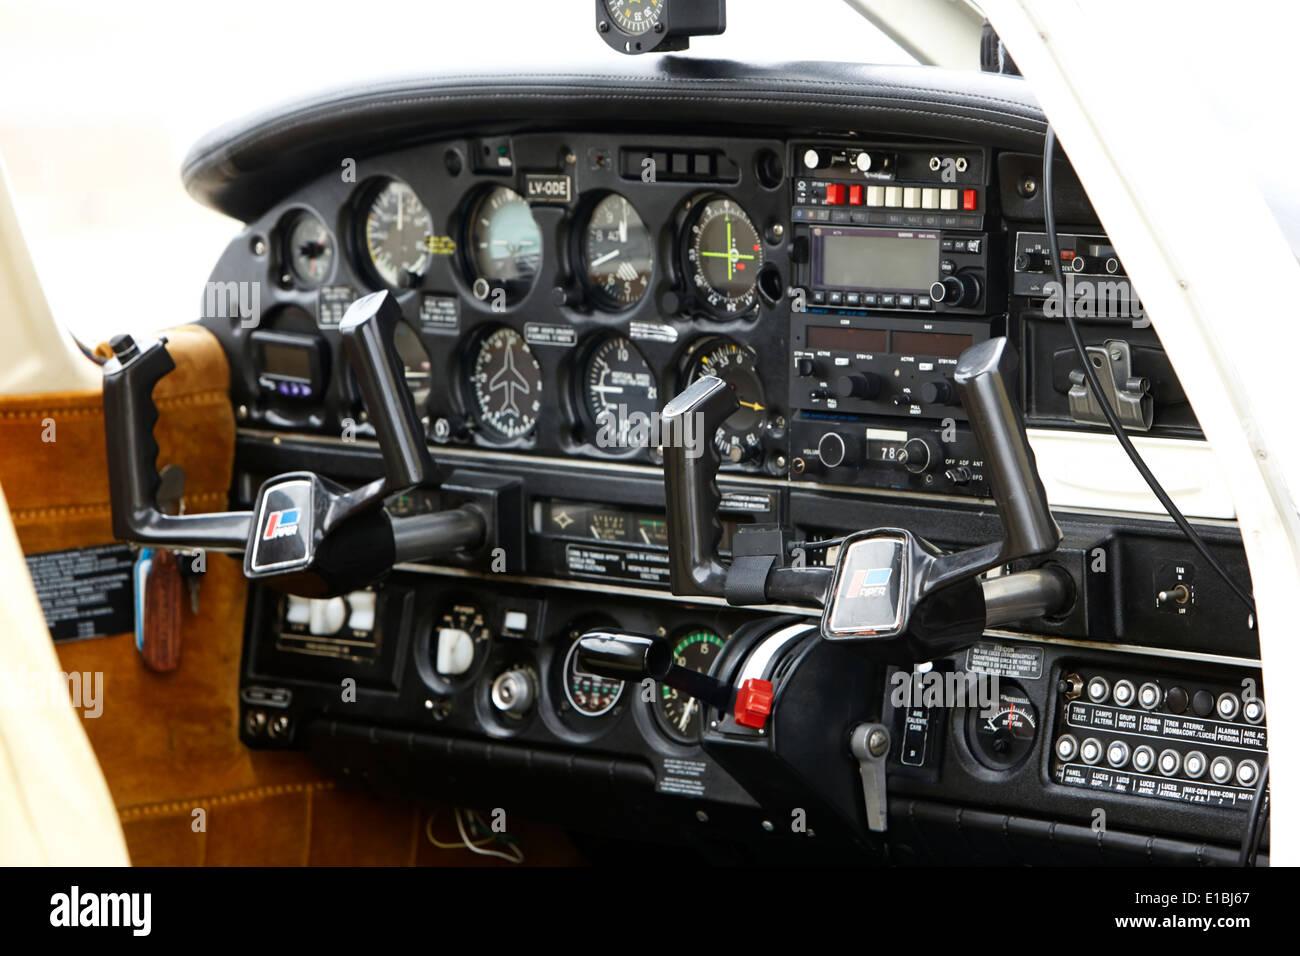 Airplane Instrument Panel Layout